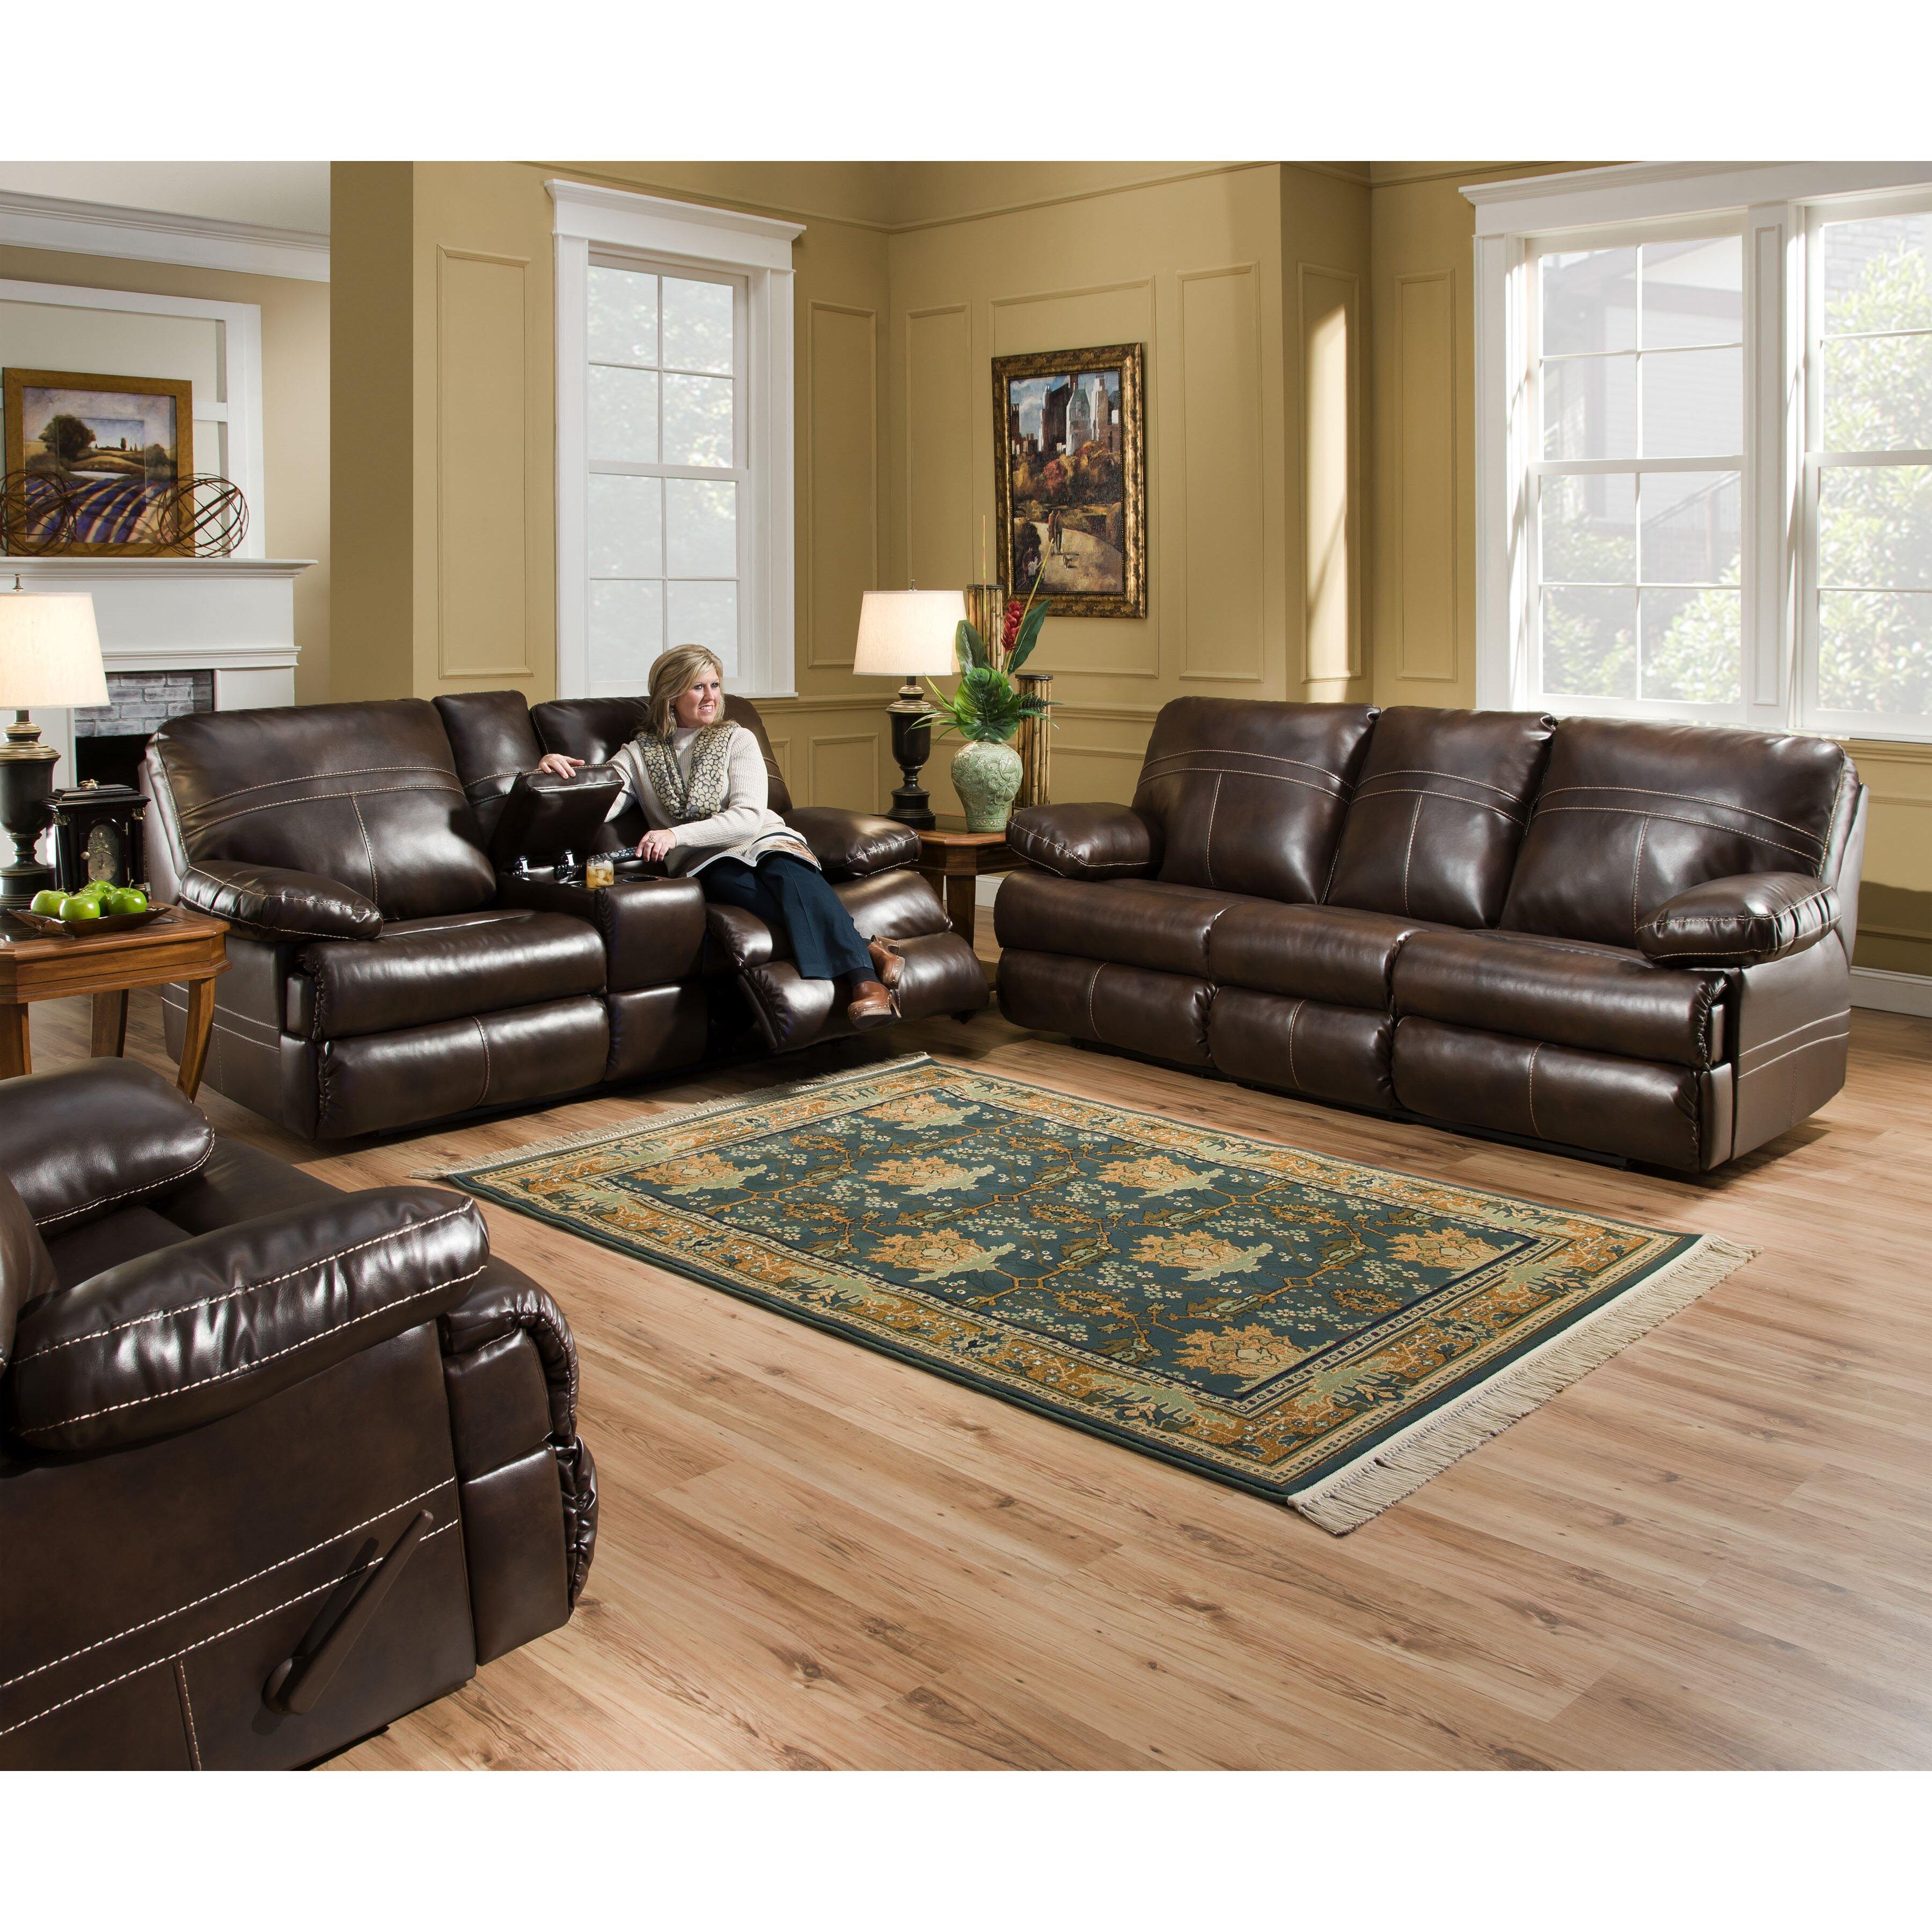 Reclining Living Room Sets Sleeper Sofa Living Room Sets Youll Love Wayfair